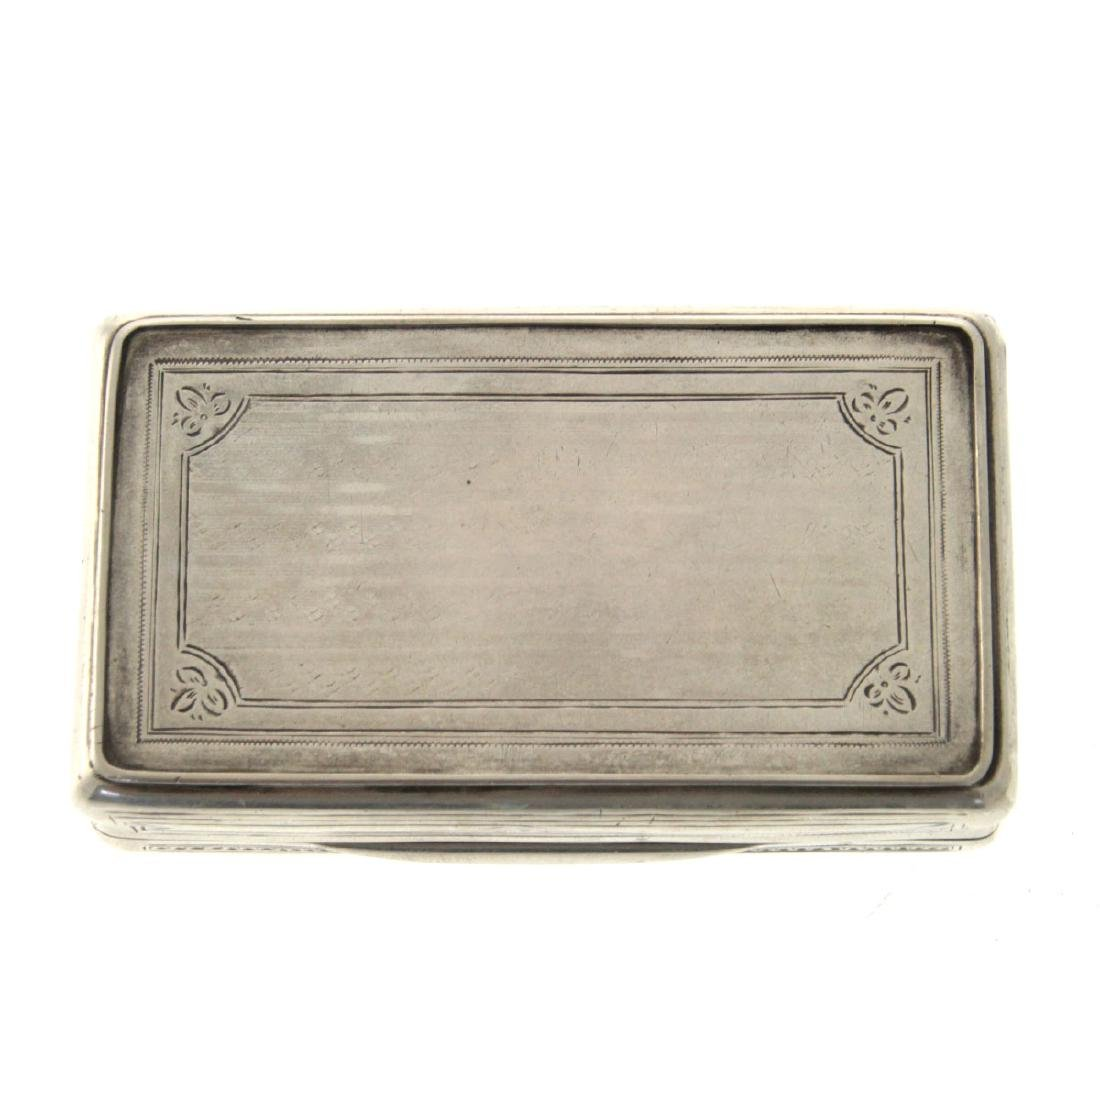 Antique Silver Snuff Box, Vienna, Austria, 1868. - 4